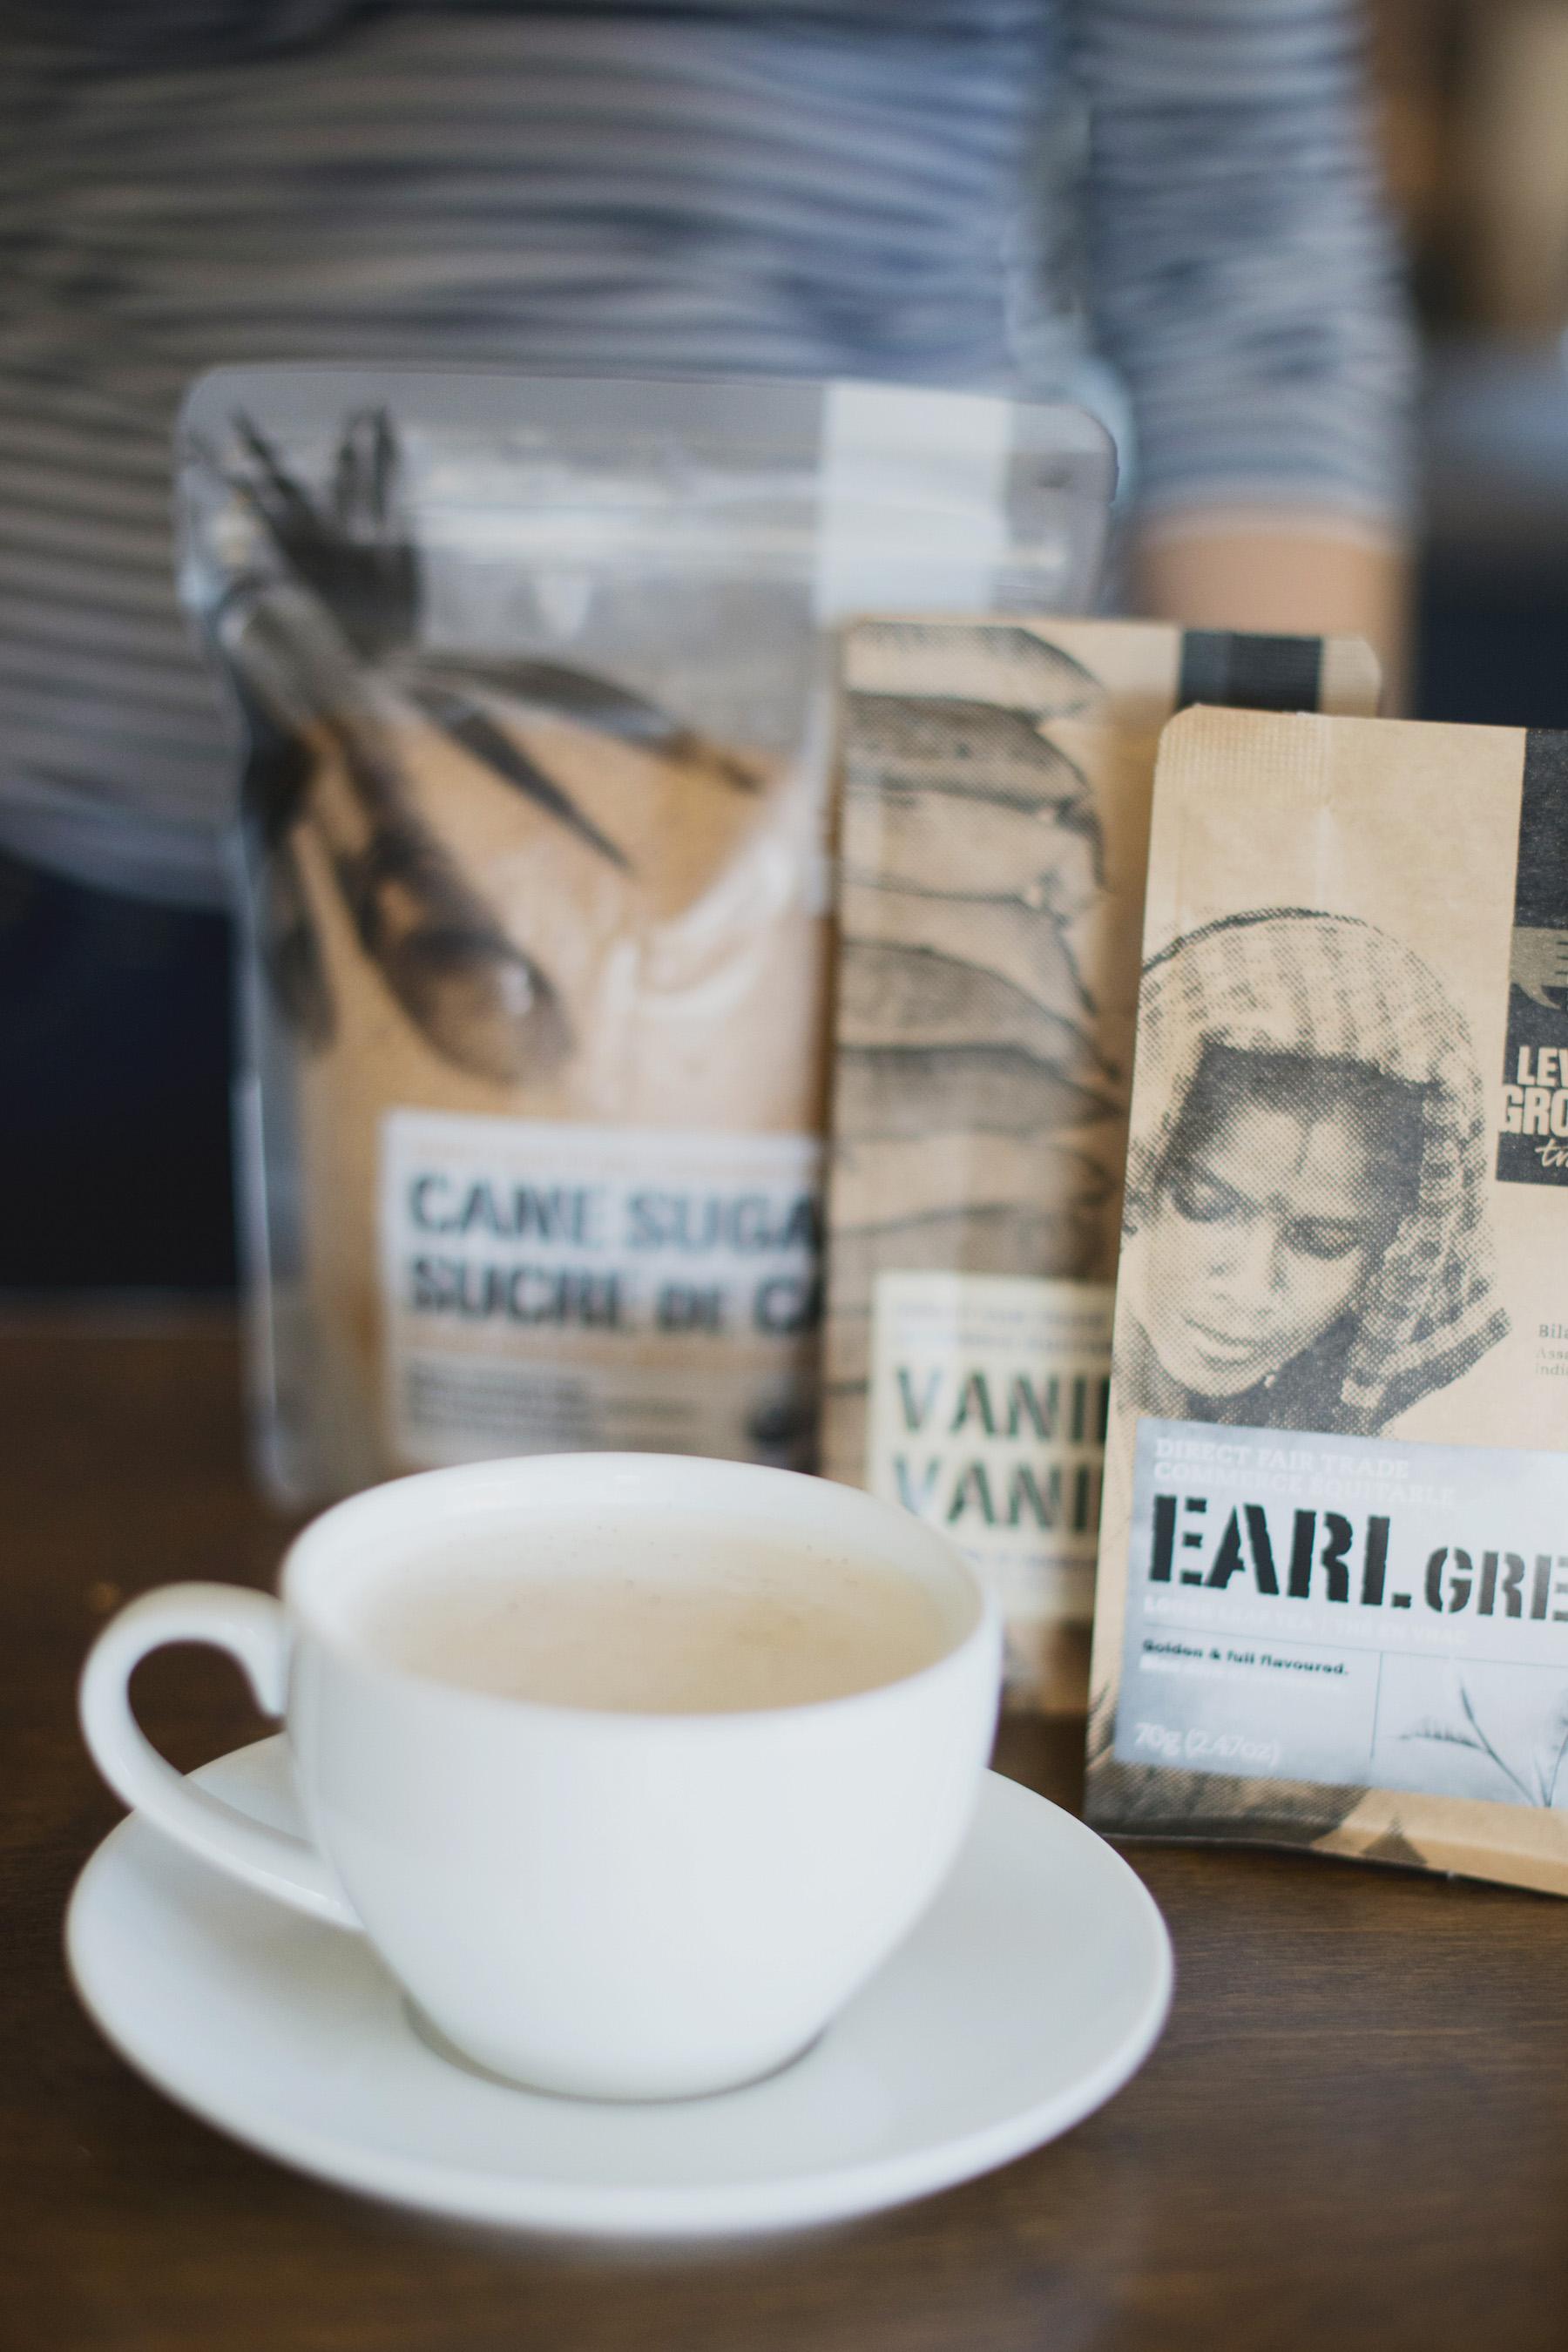 RECIPE: How to make a london fog using earl grey tea, vanilla beans, and cane sugar.